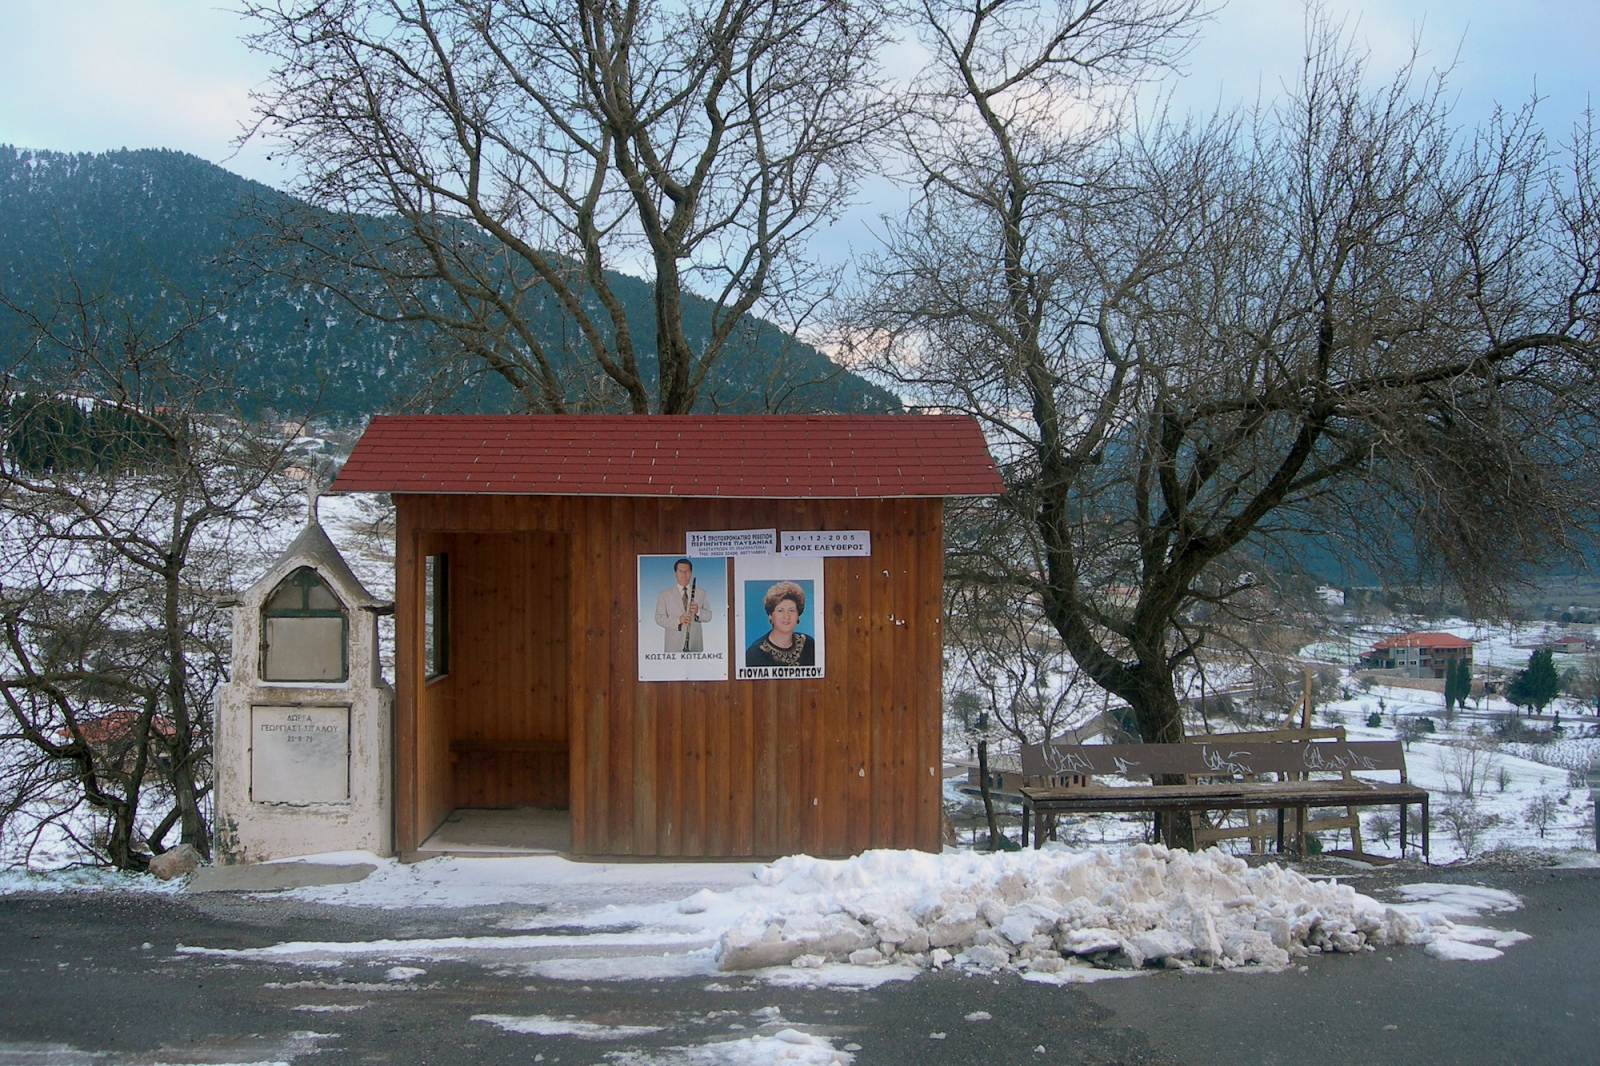 Bus stop. Peloponnese, Greece.